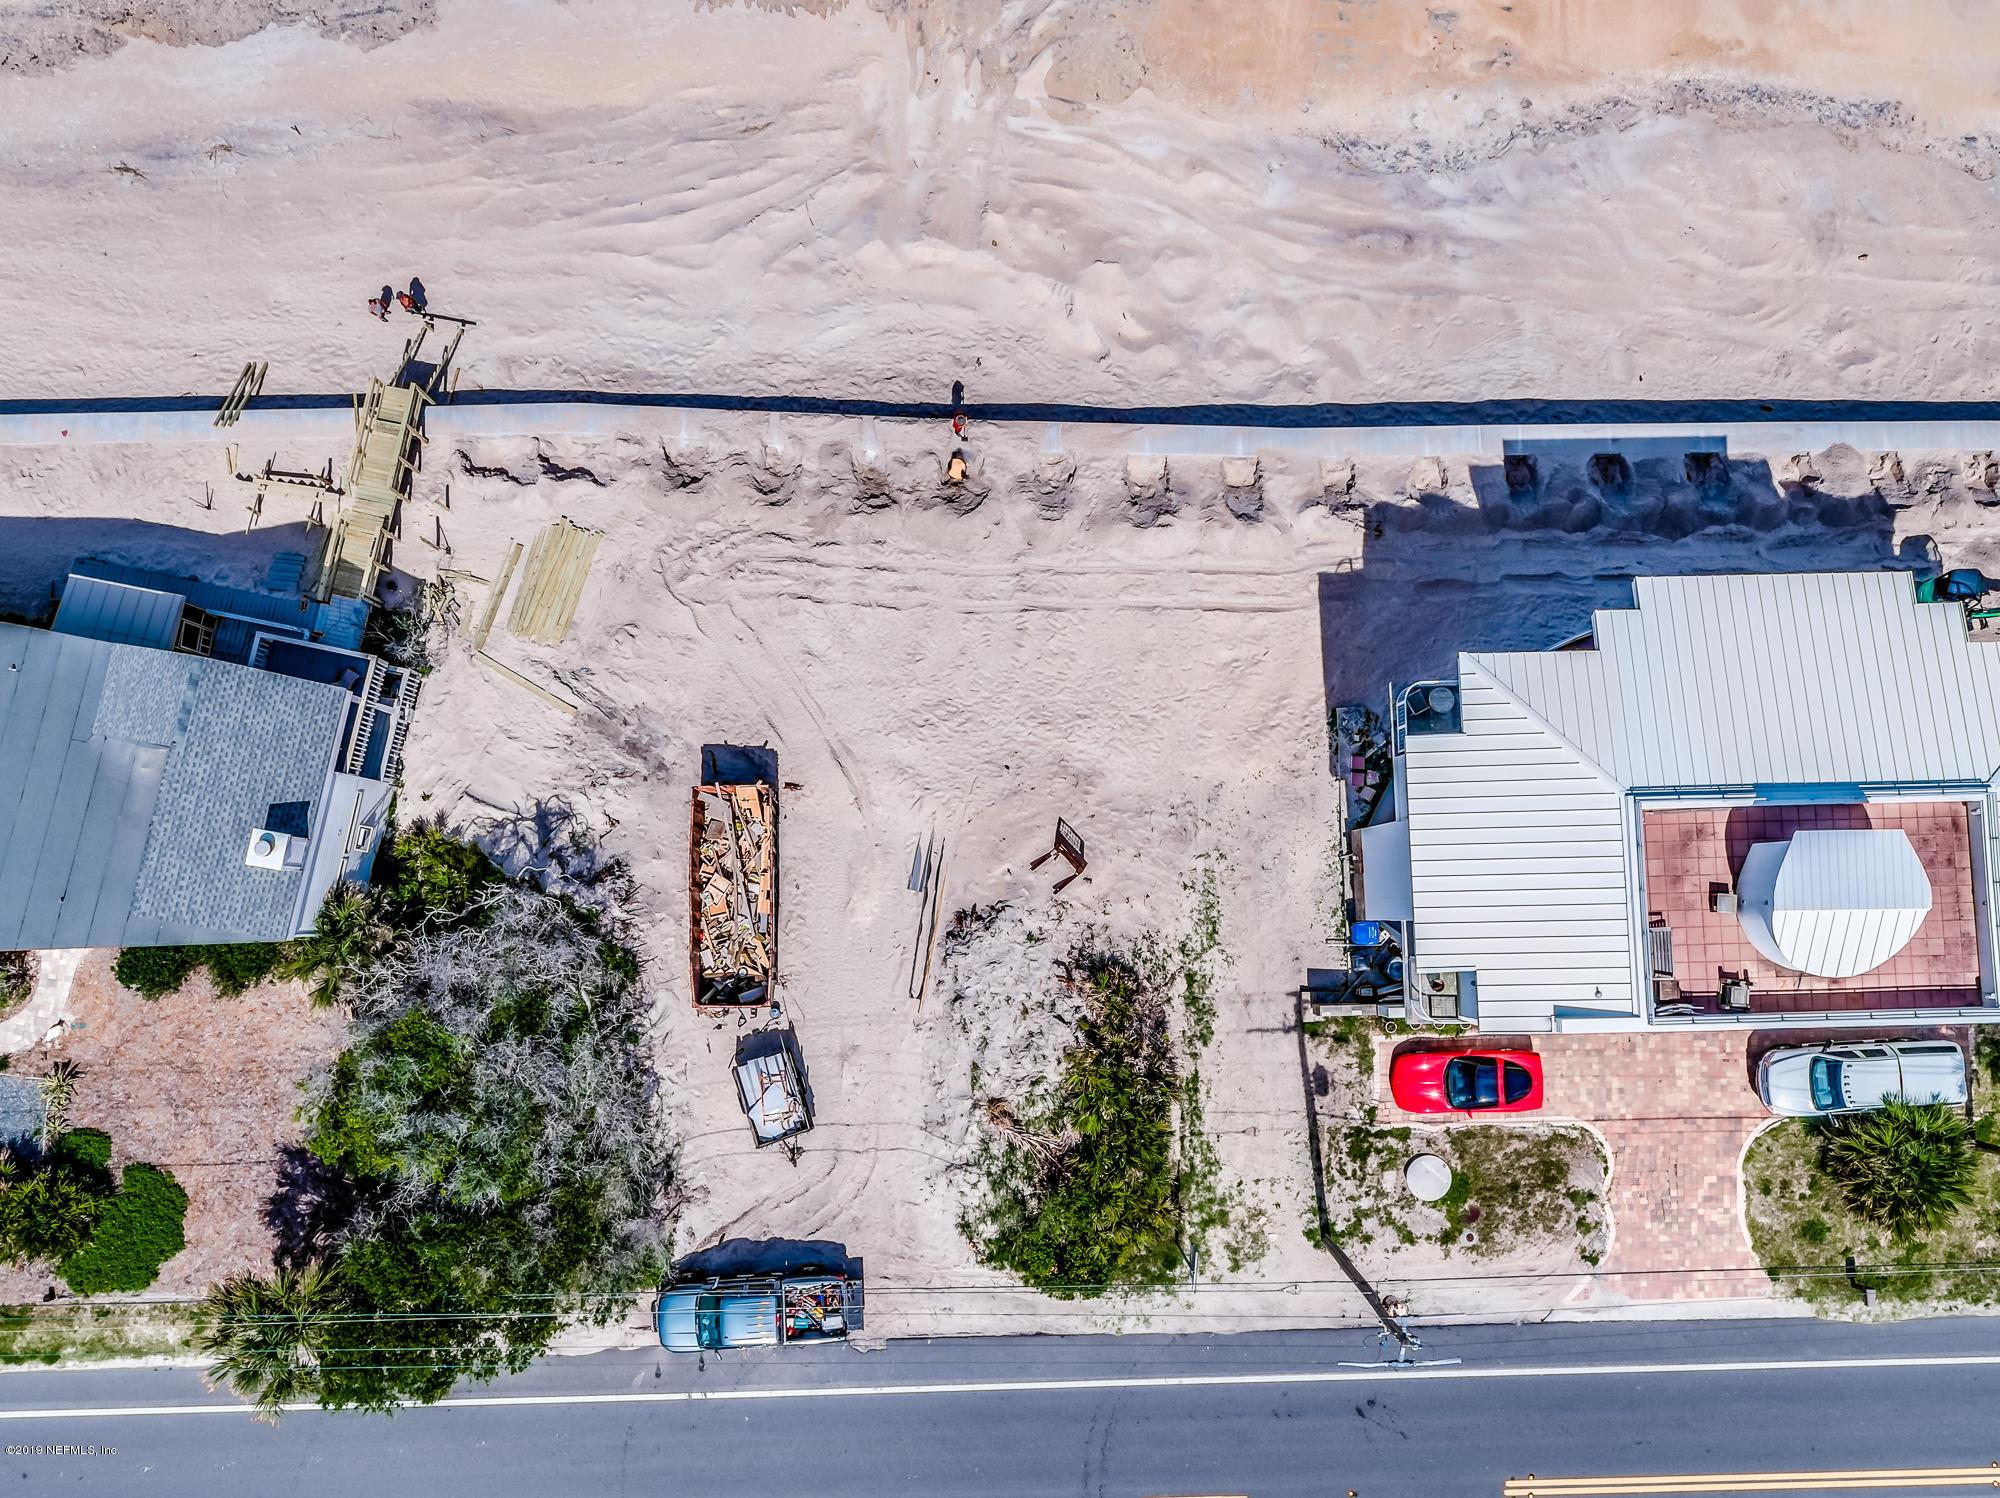 3125 PONTE VEDRA, PONTE VEDRA BEACH, FLORIDA 32082, ,Vacant land,For sale,PONTE VEDRA,994902